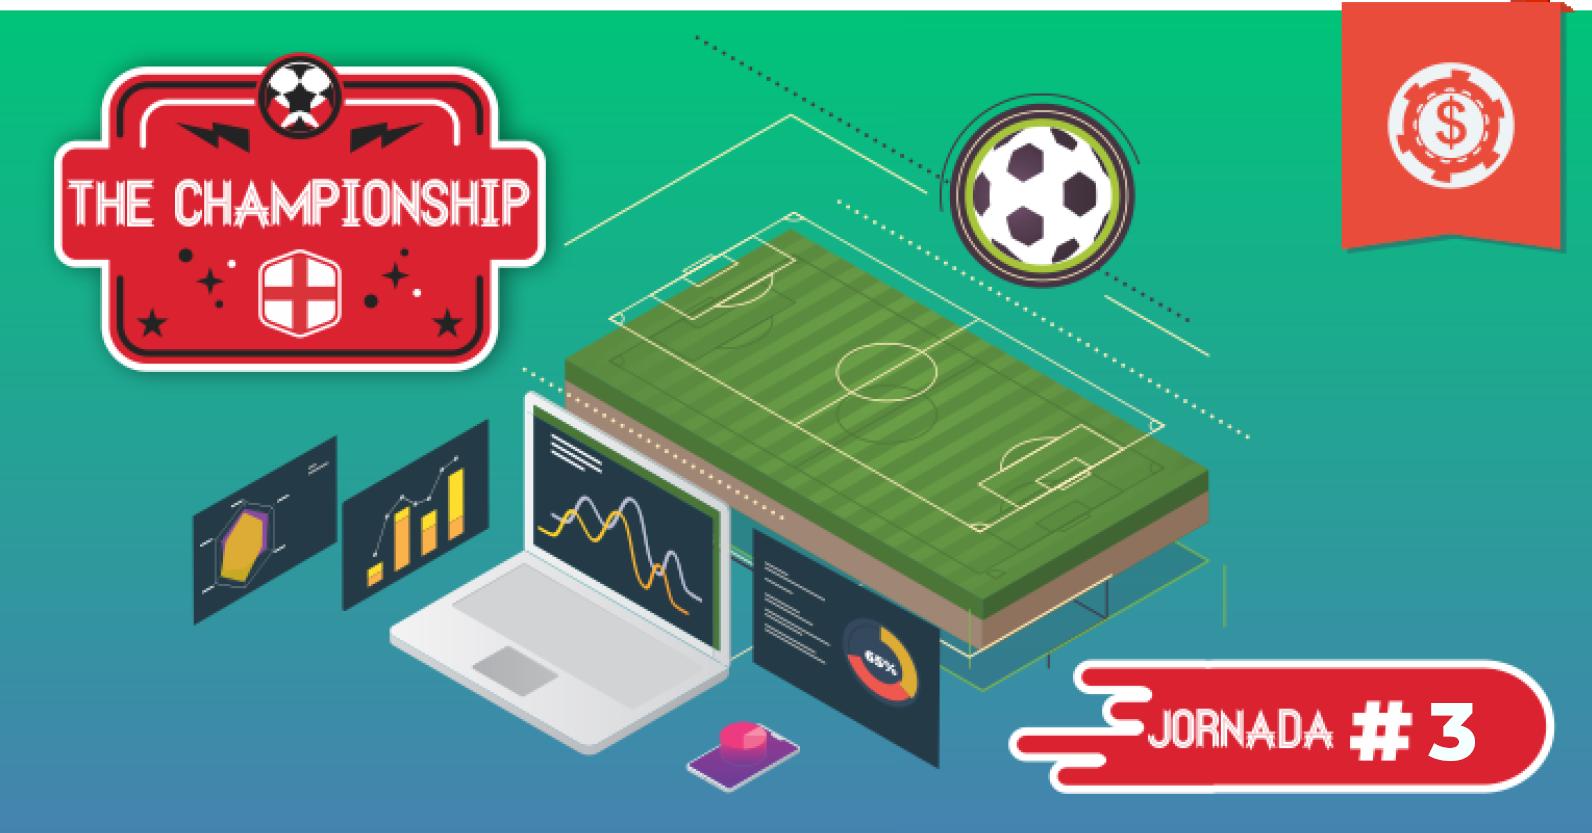 pronosticos-championship-segunda-division-inglesa-apuestas-jornada-3